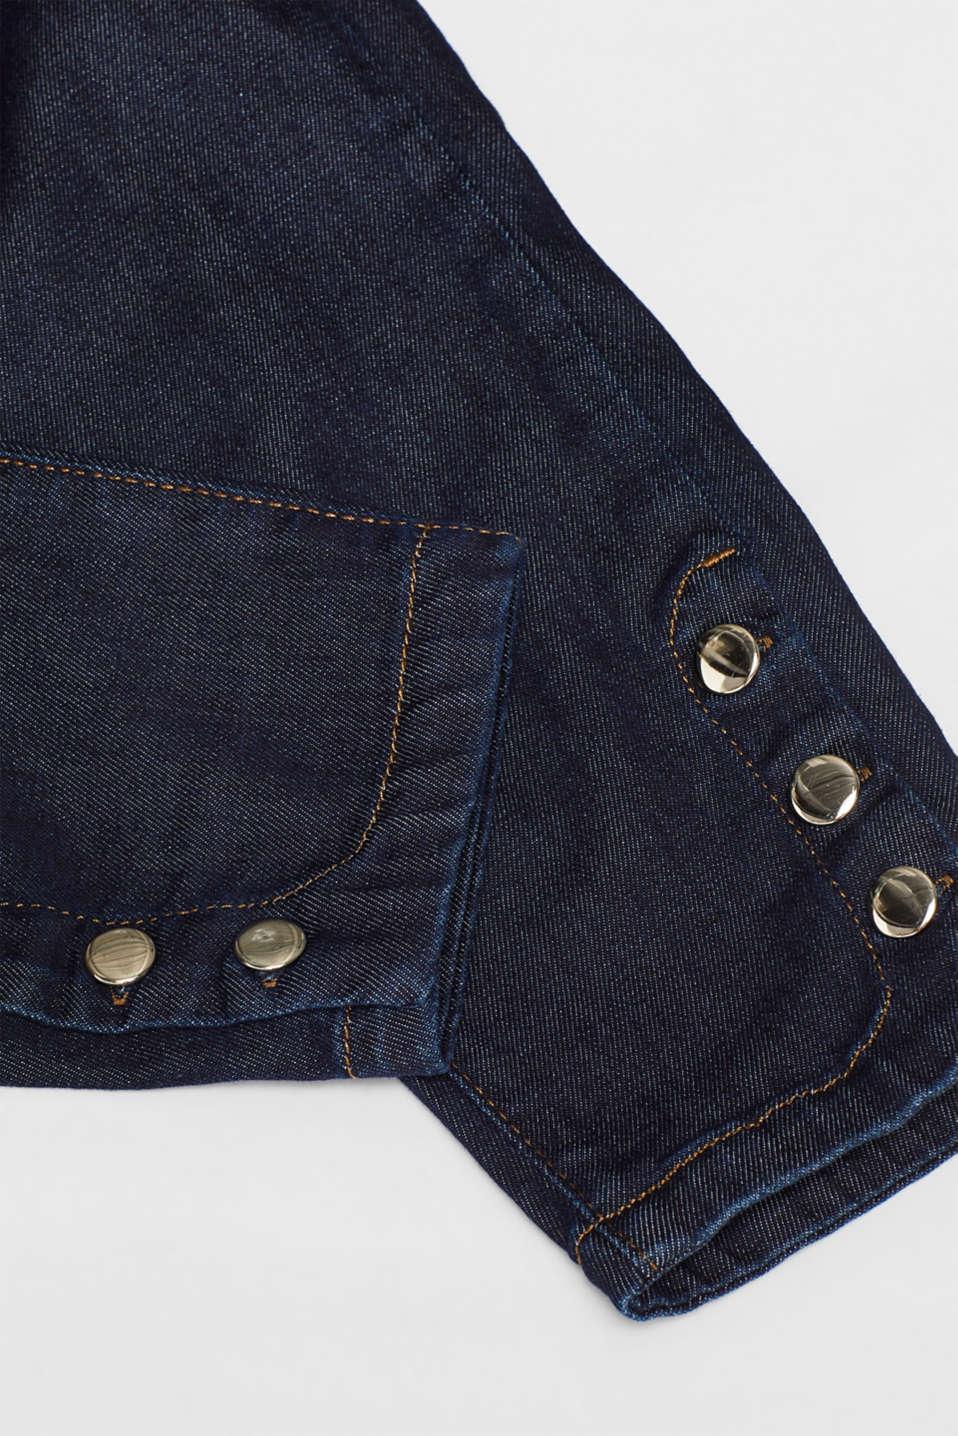 Pants denim, BLUE RINSE, detail image number 2